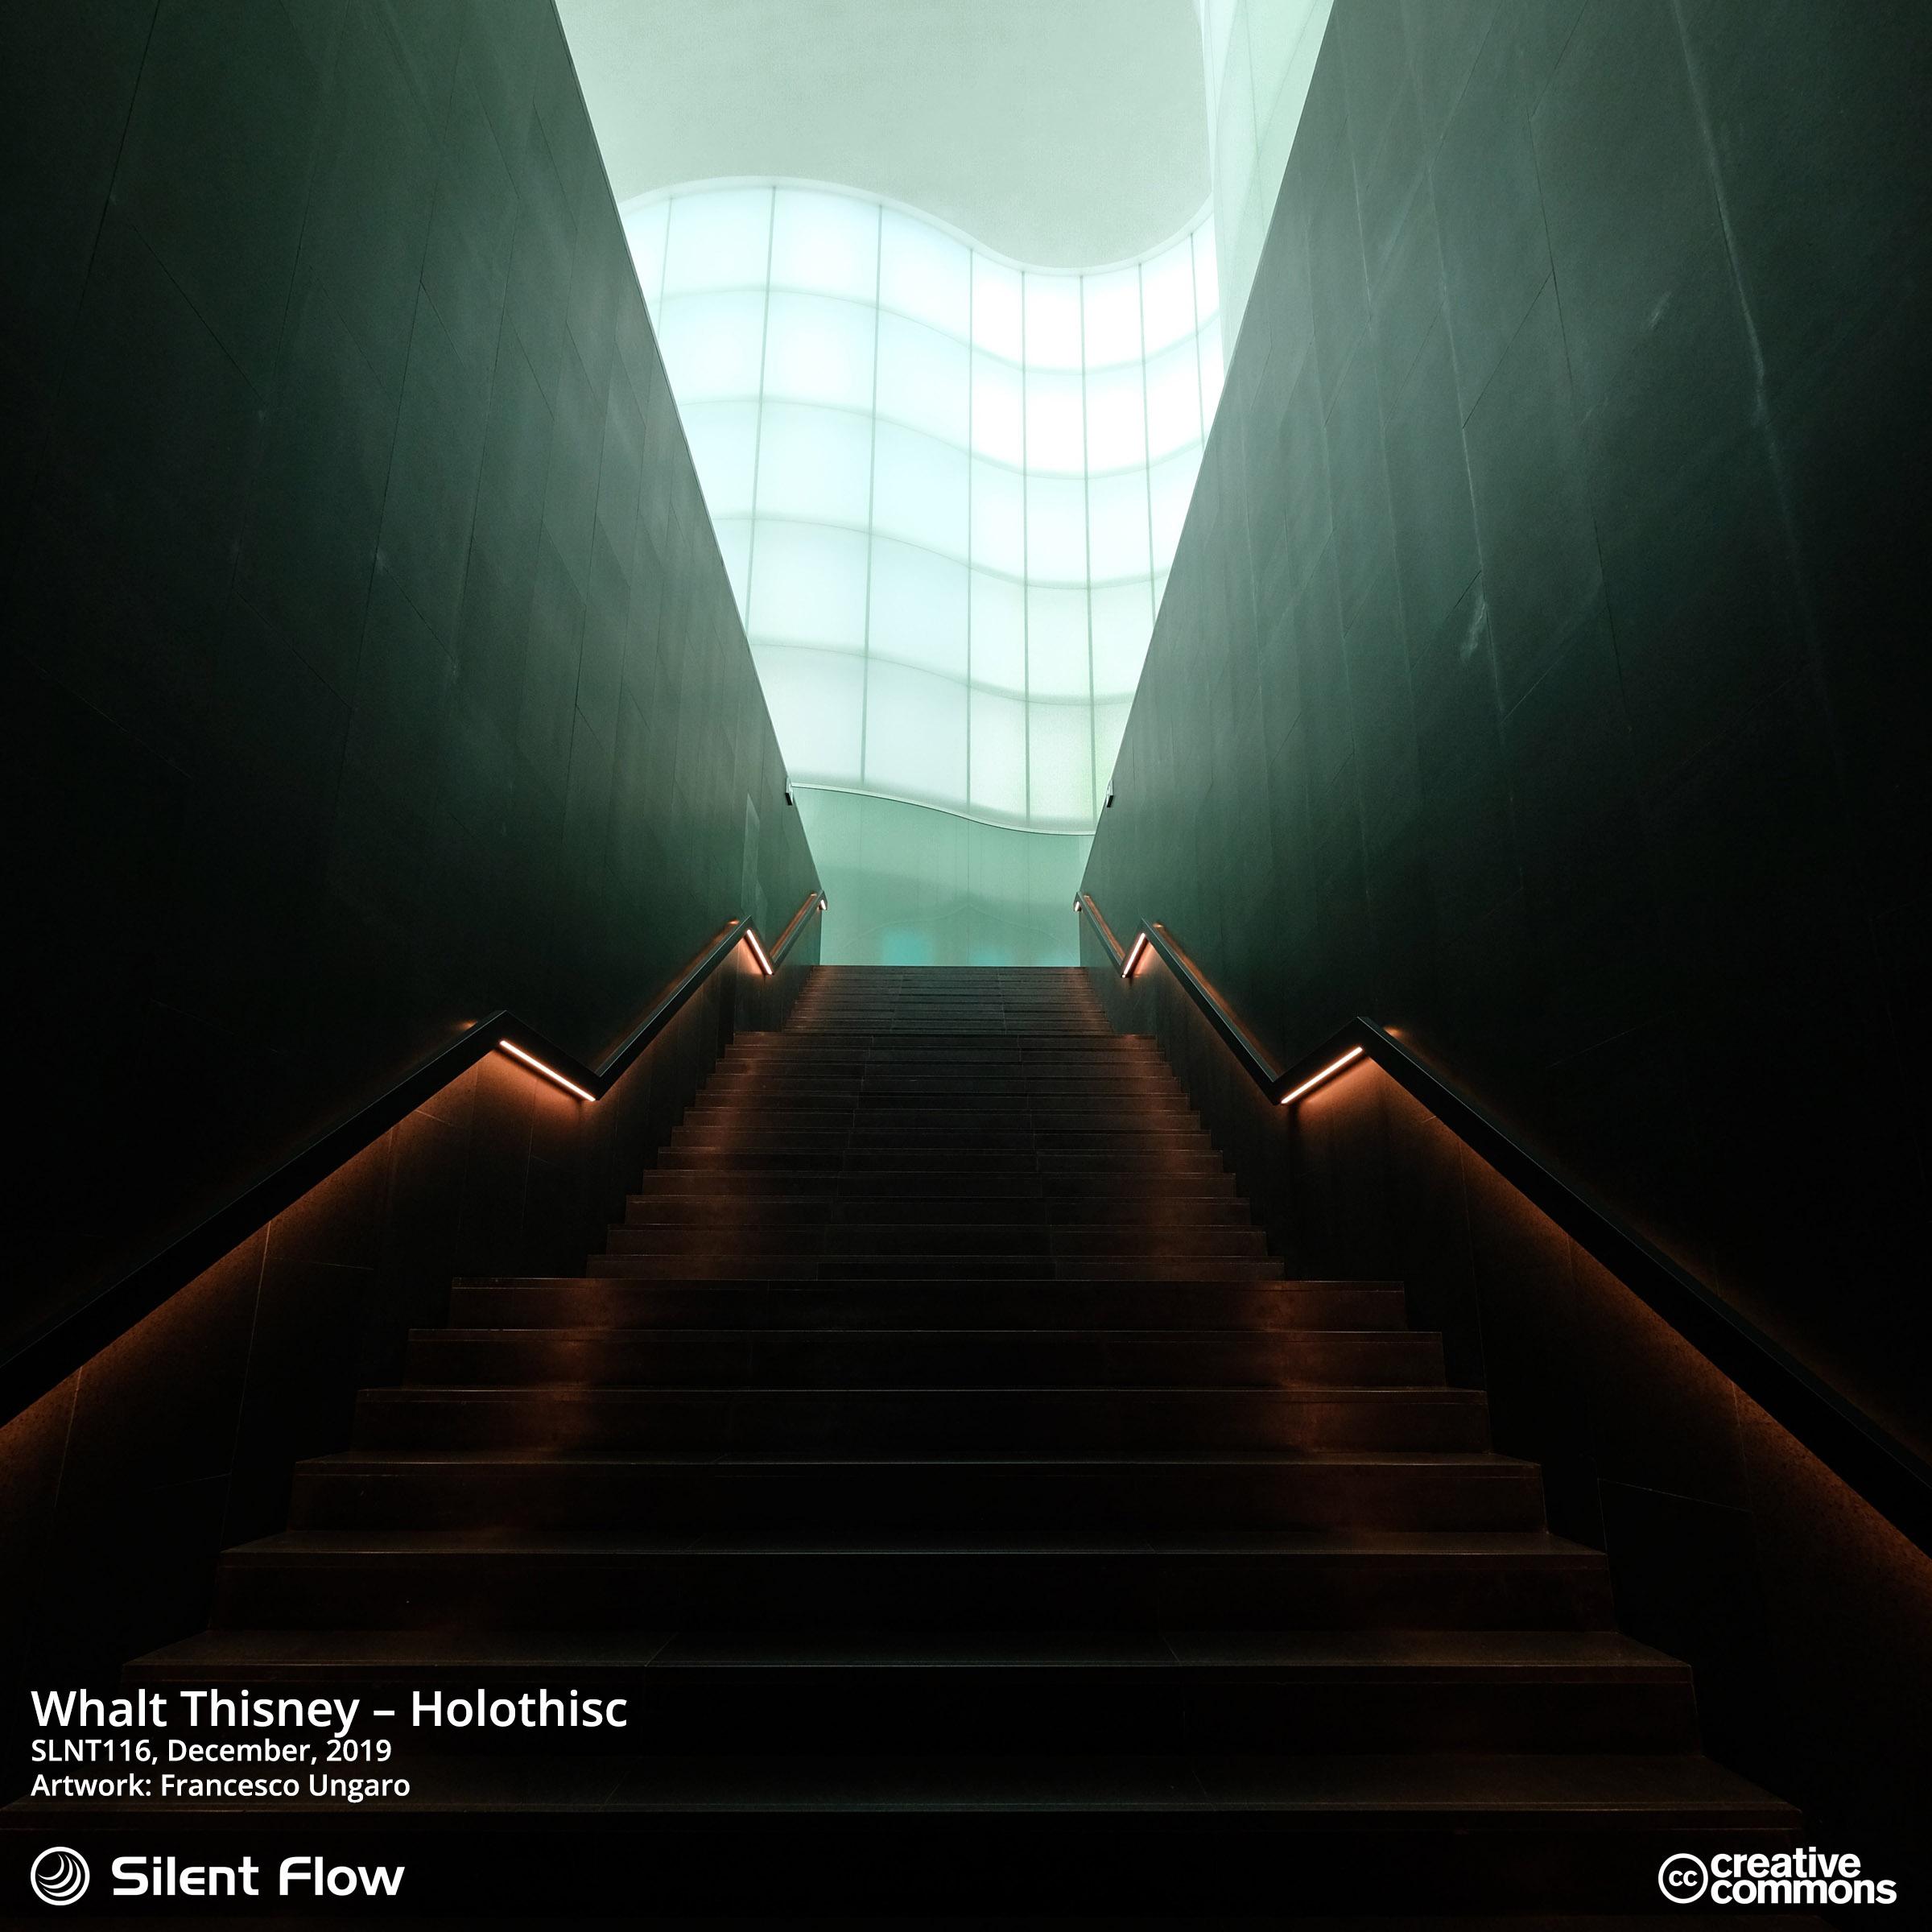 Whalt Thisney – Holothisc